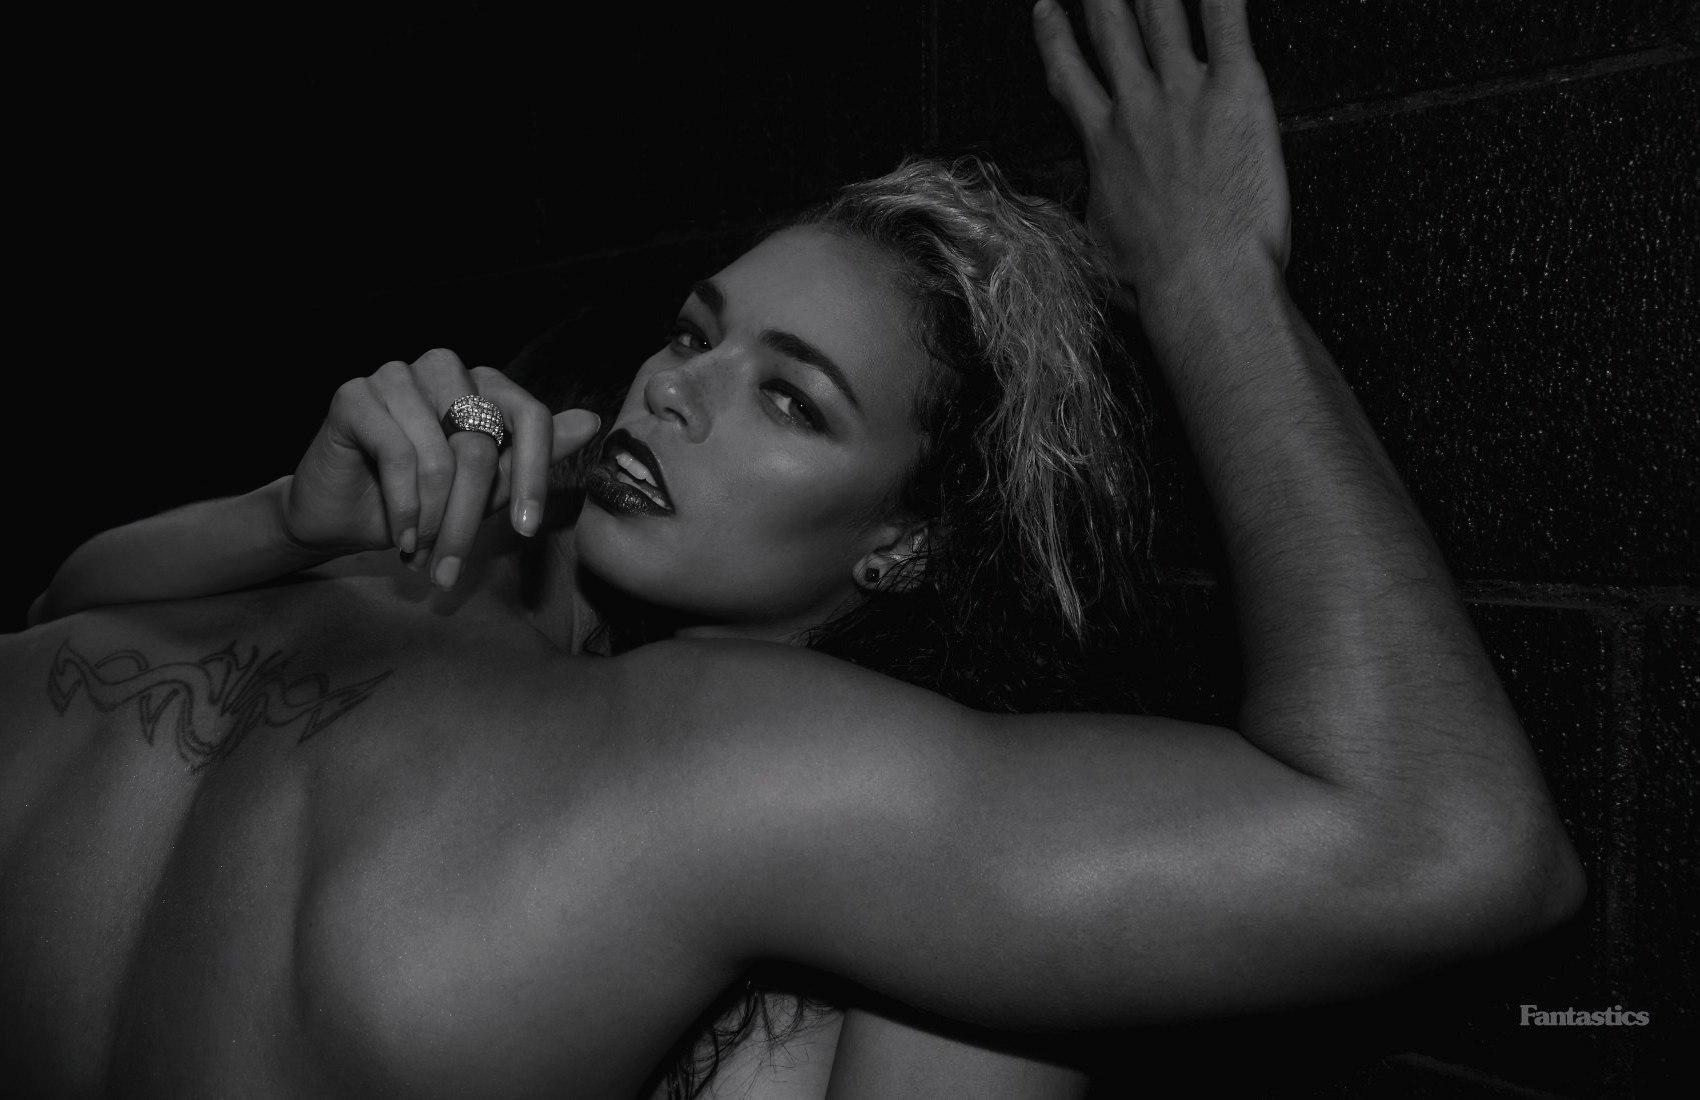 "#Fashion >> Ropa, Modelos & Tendencias ""Now: ANTM Cycle 23 (Rita Ora, Nueva Host)"" - Página 8 DYrWCub9"